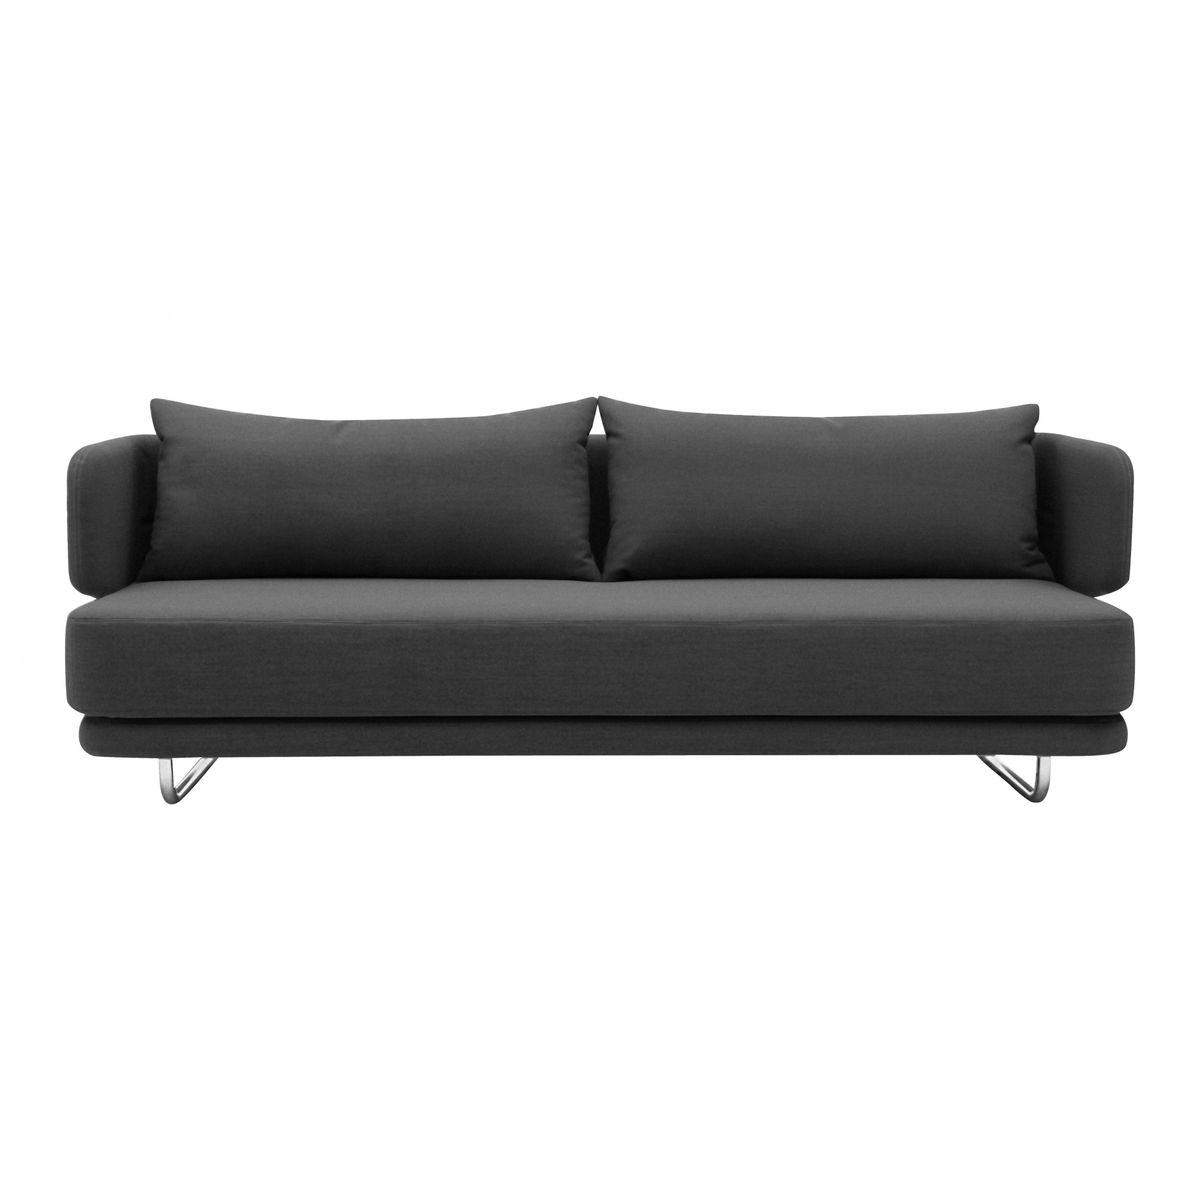 Softline Jasper Sofa Bed Refil Sofa